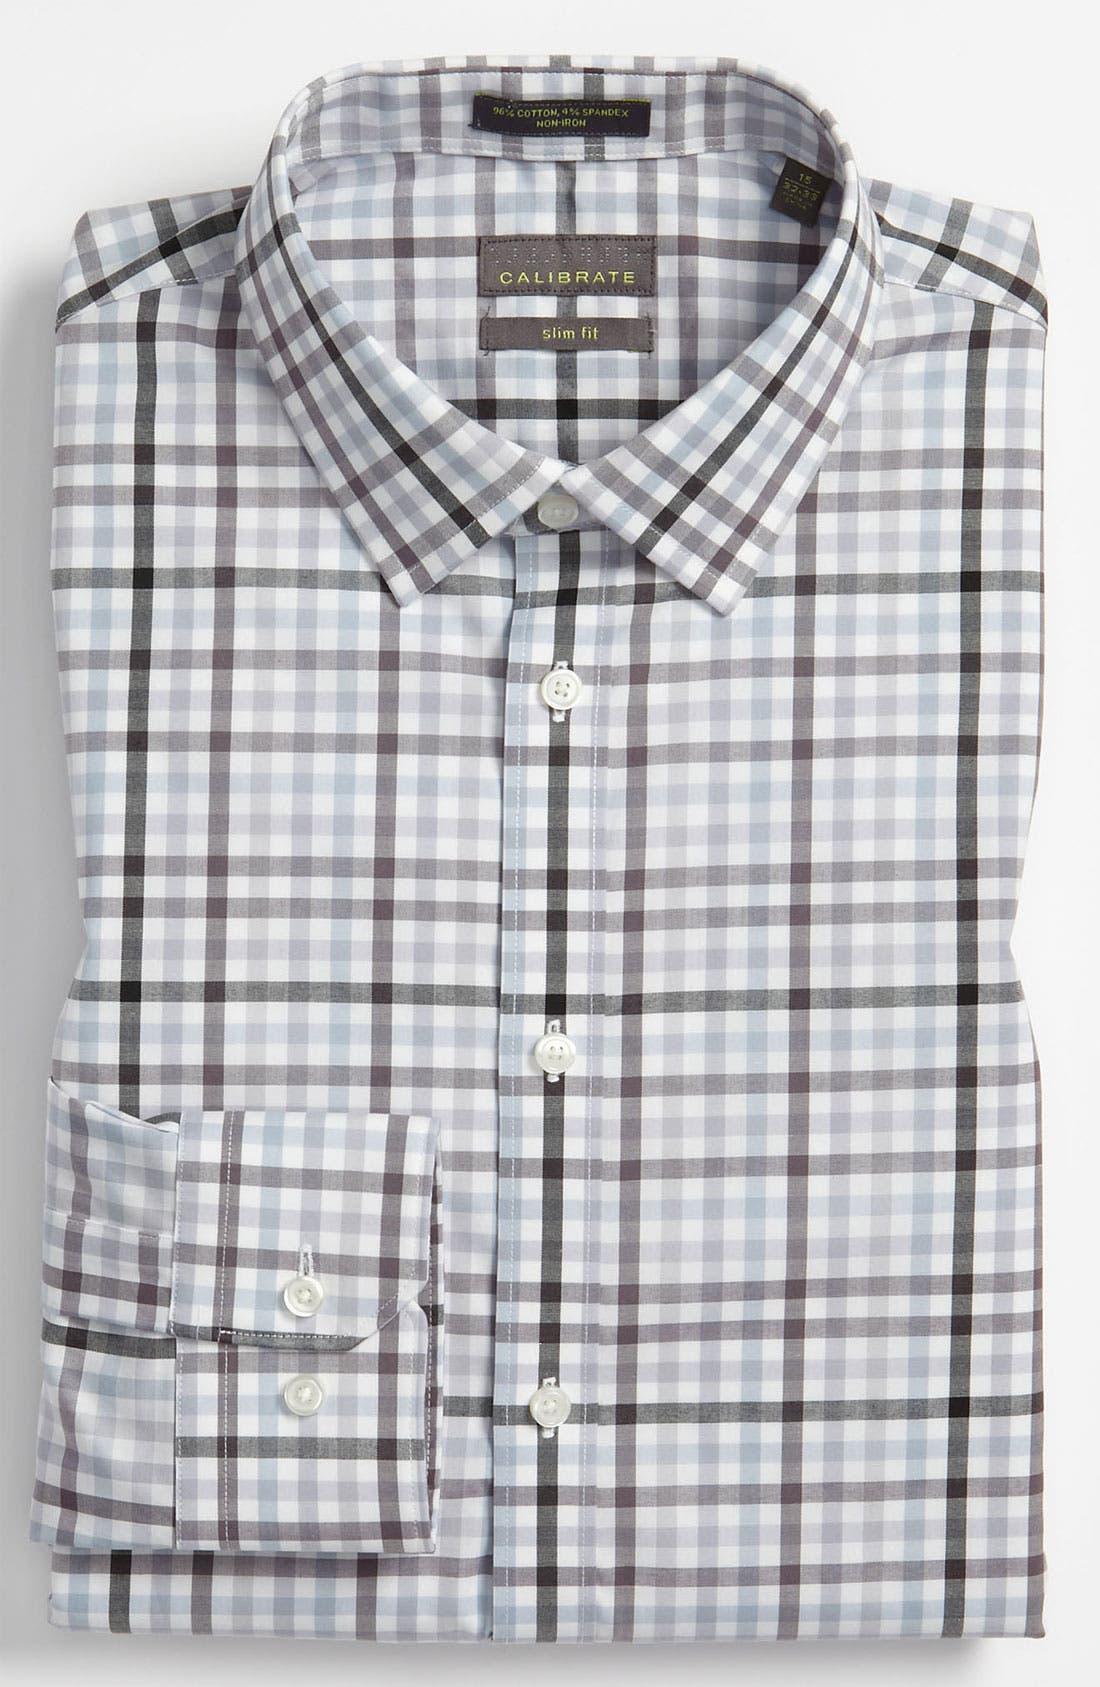 Alternate Image 1 Selected - Calibrate Slim Fit Non Iron Dress Shirt